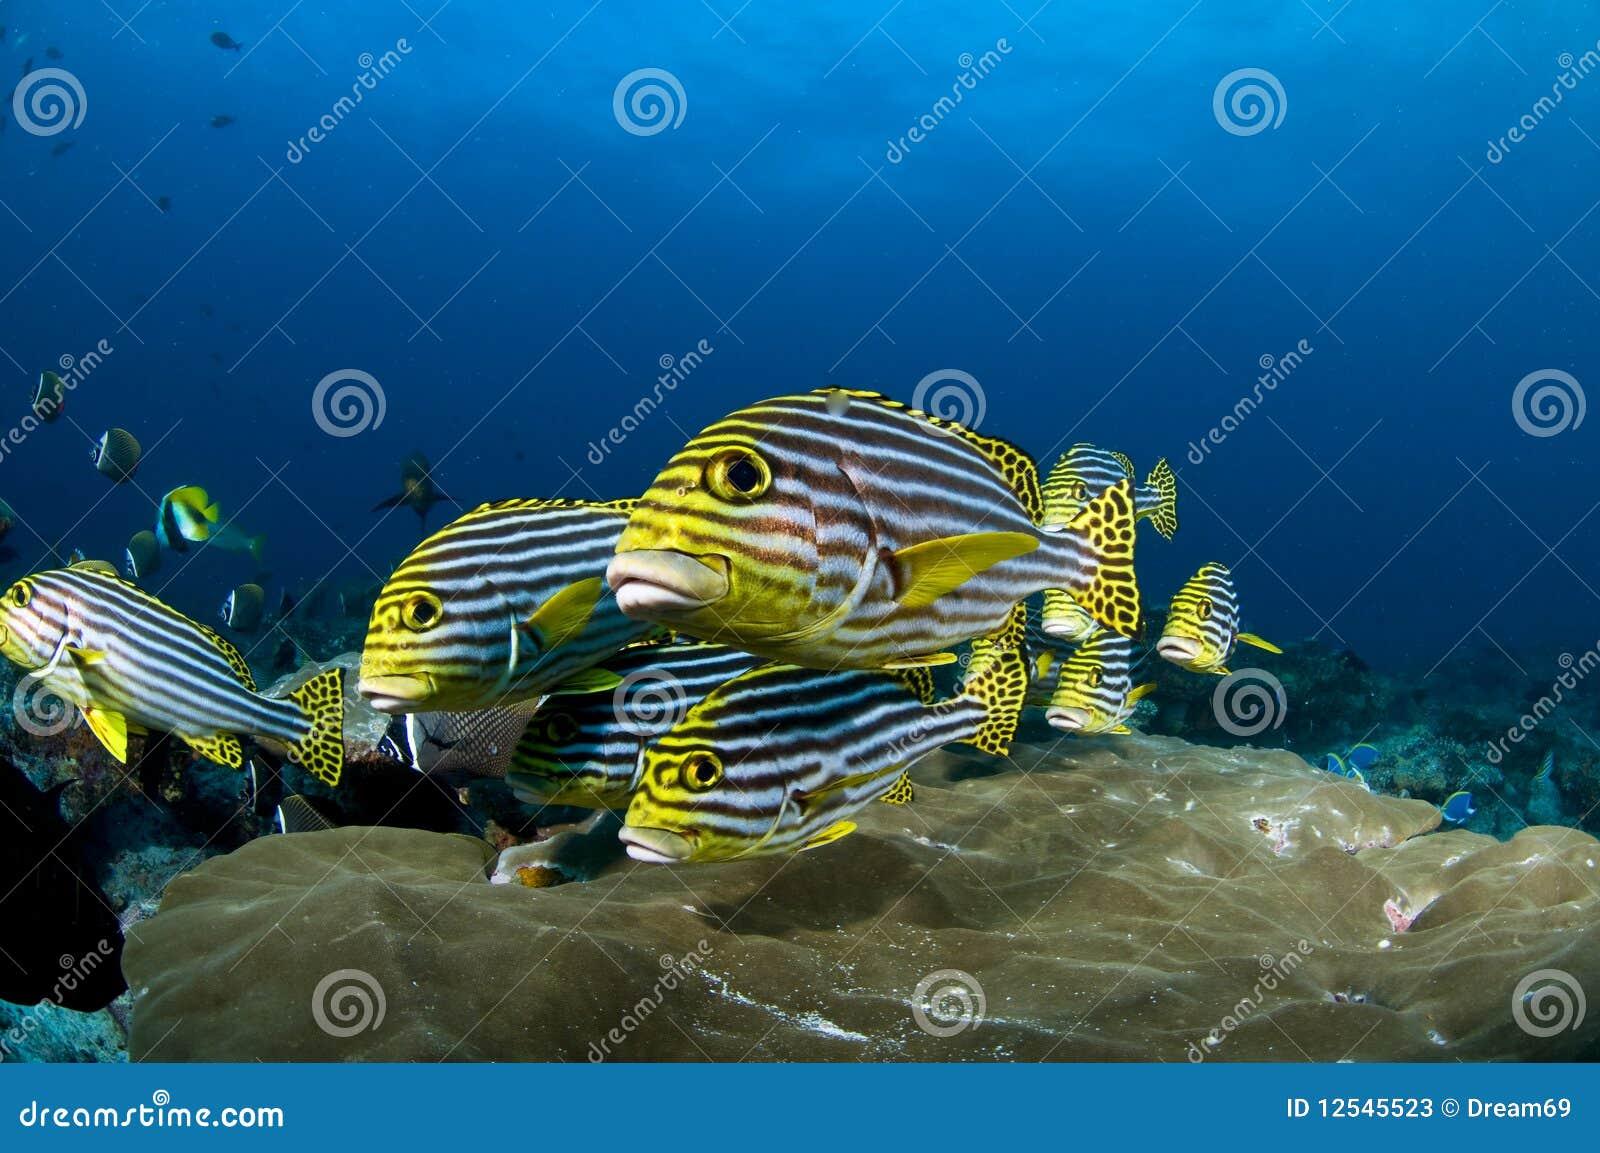 reef and yellow fish indian ocean maldives stock photos image